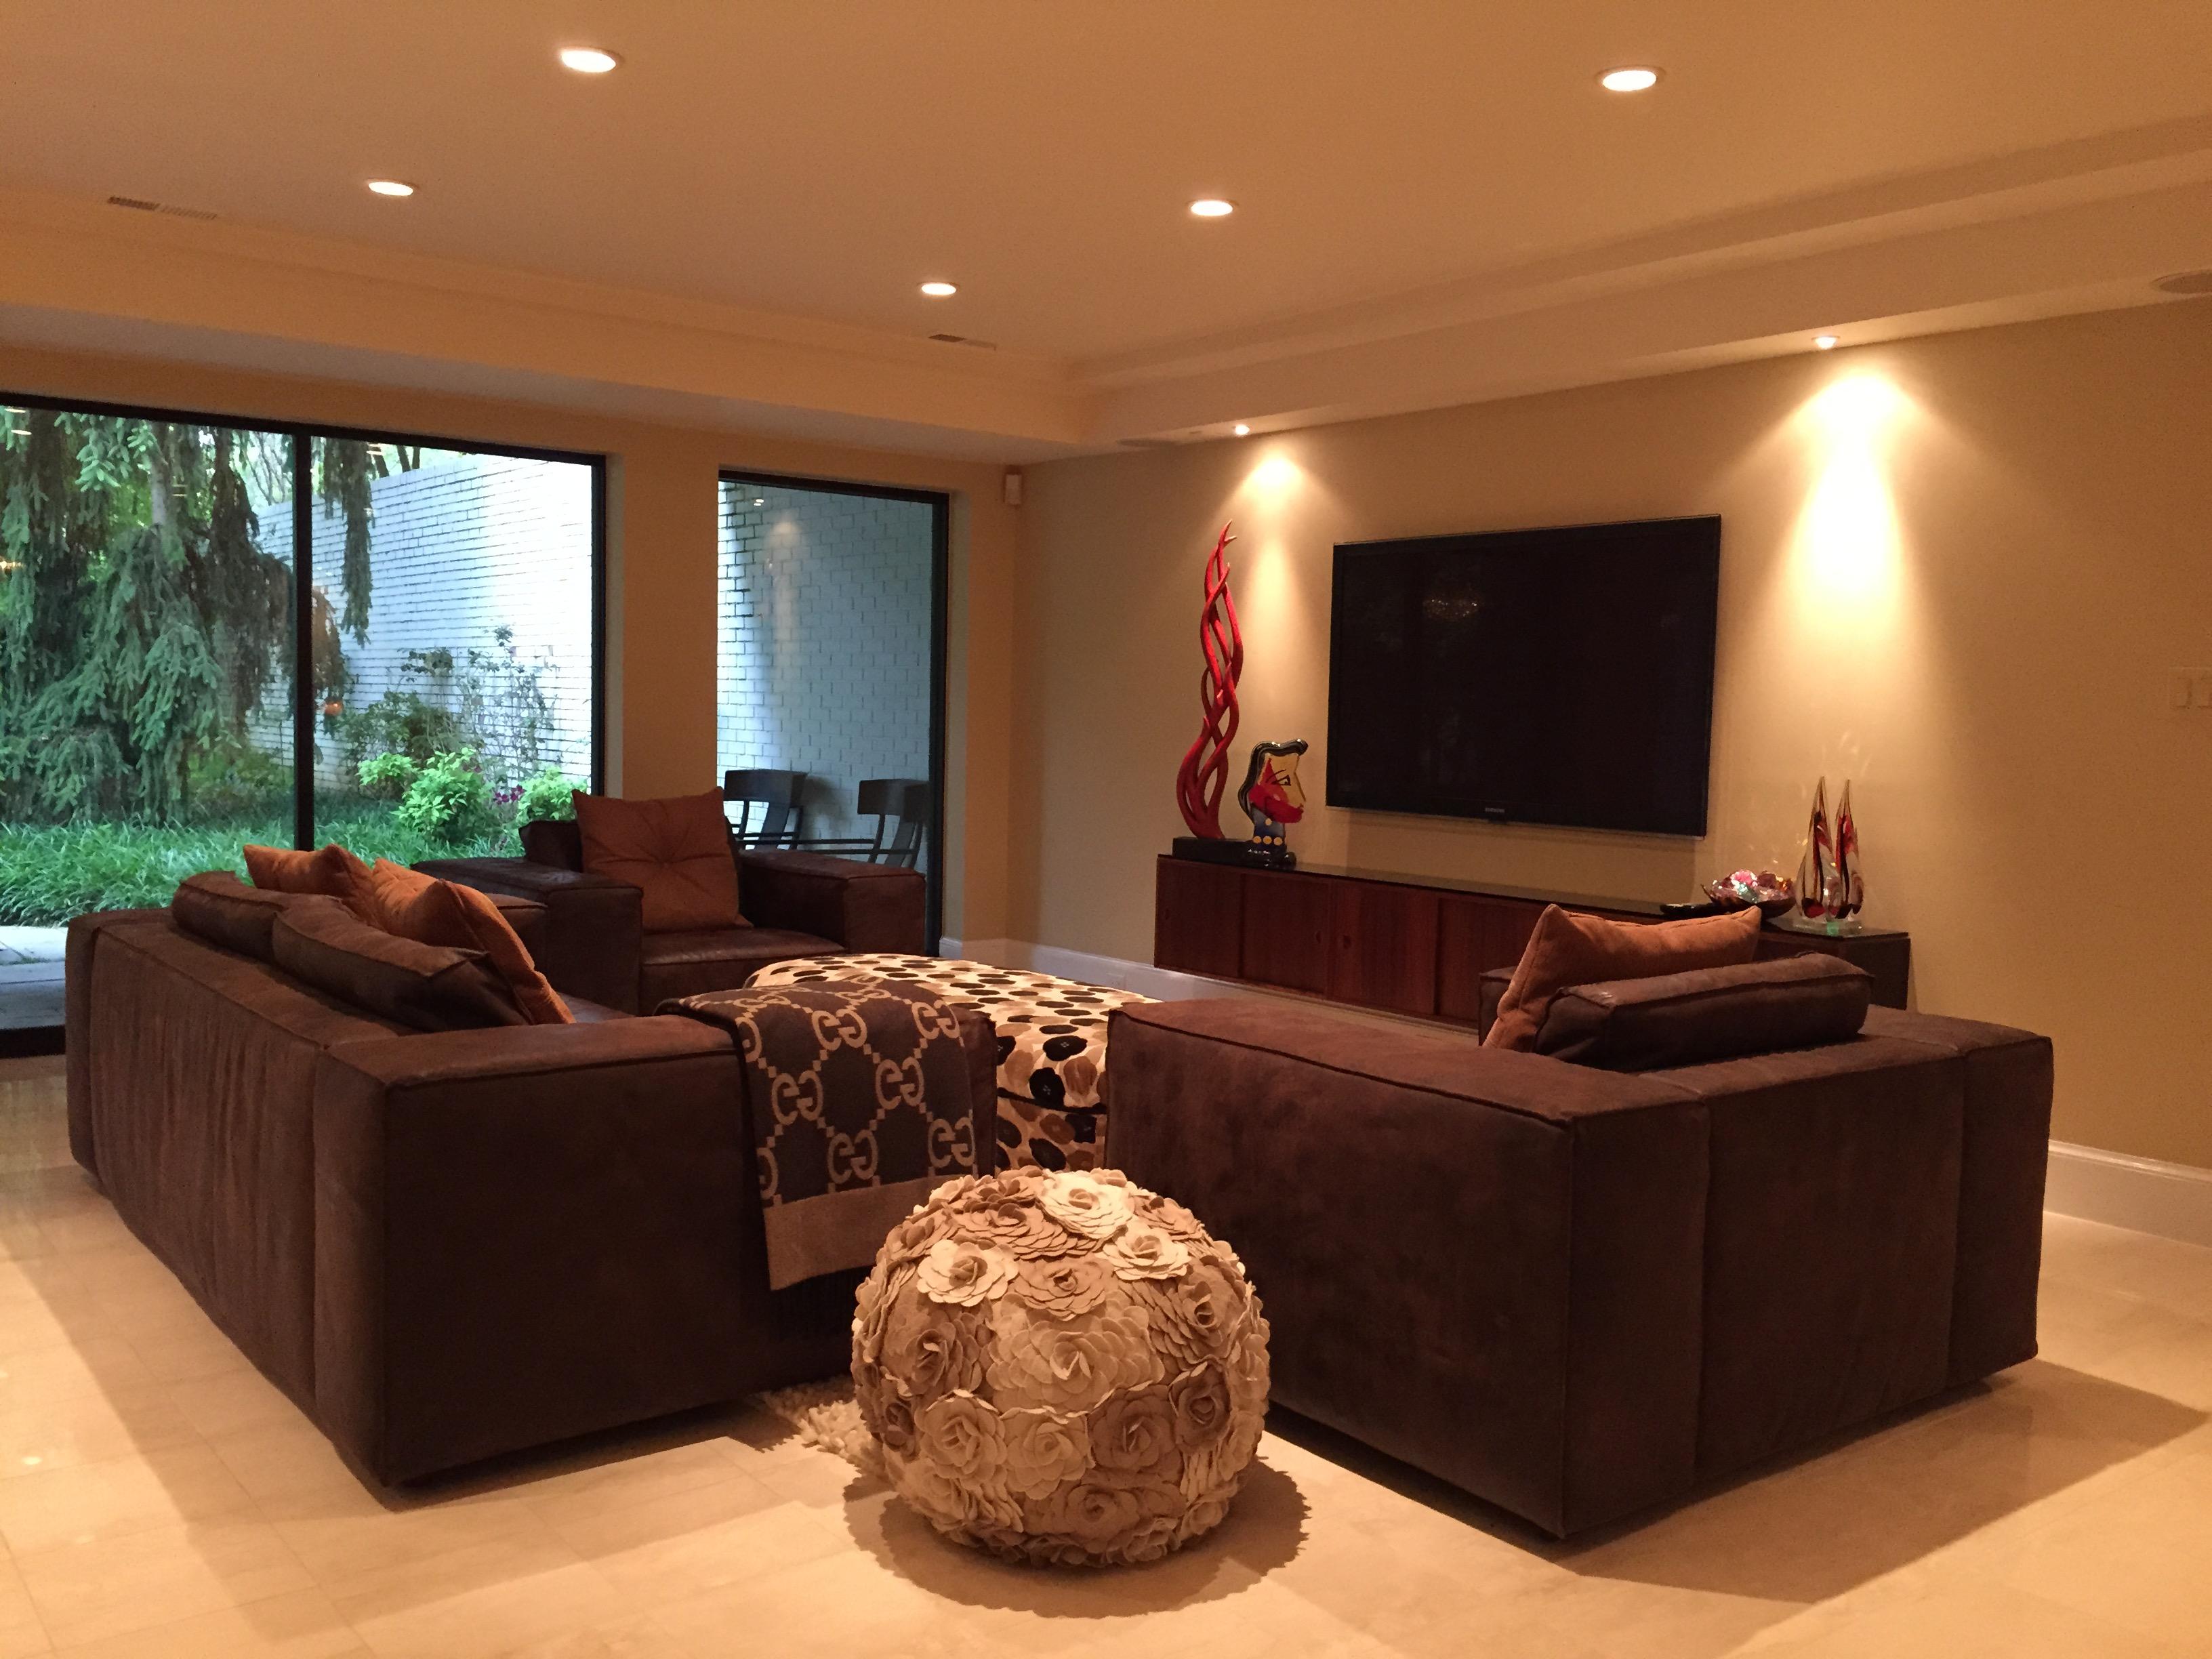 interior modern on home improvement cool decor amazing light ideas with lighting